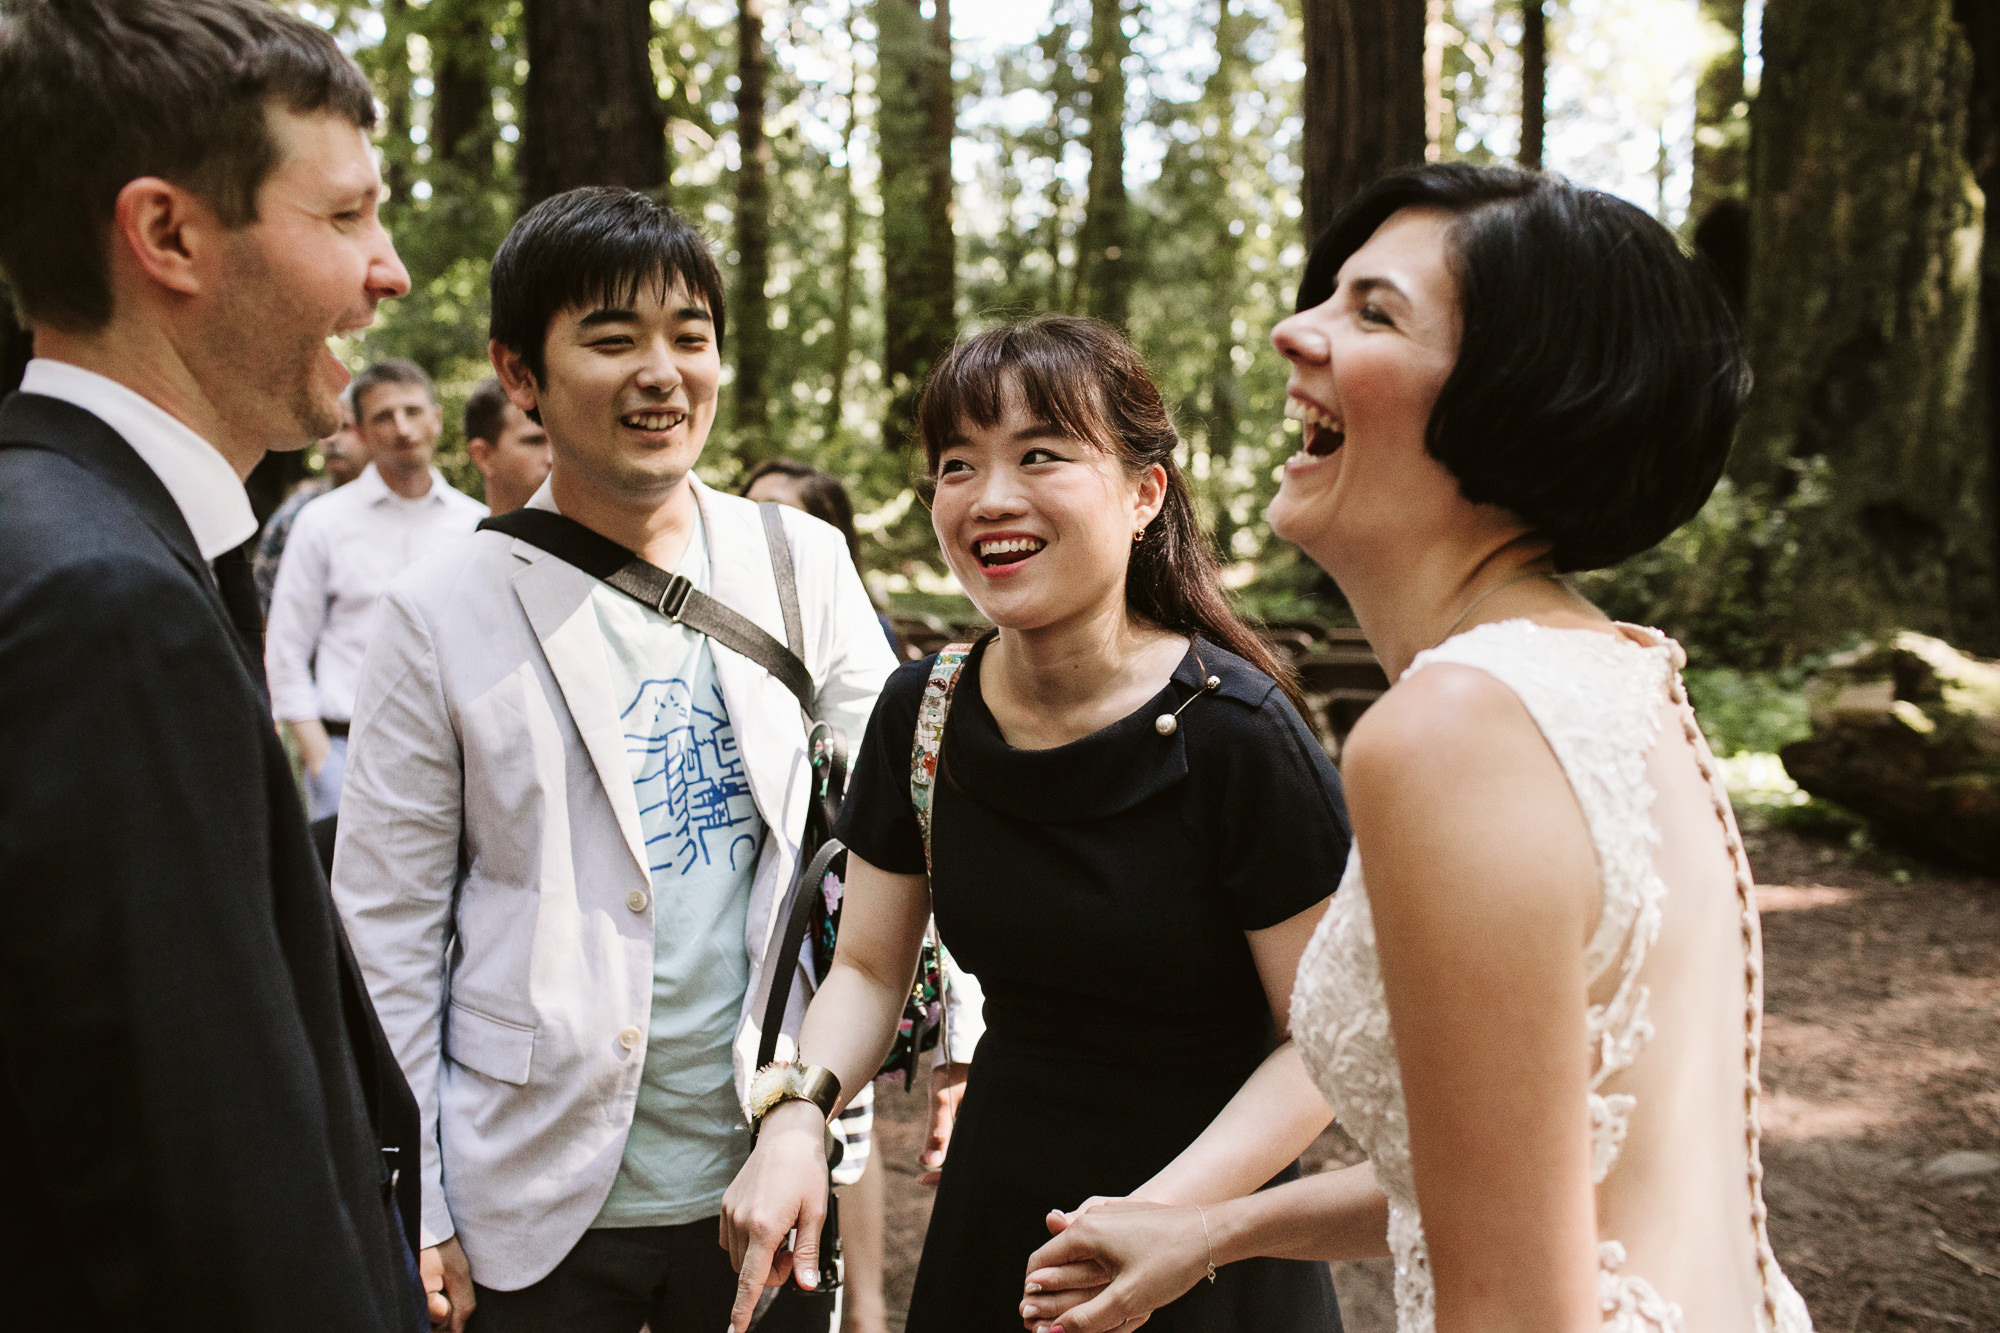 California-wedding-photographer-alfonso-flores-pamplin-groove-224.jpg